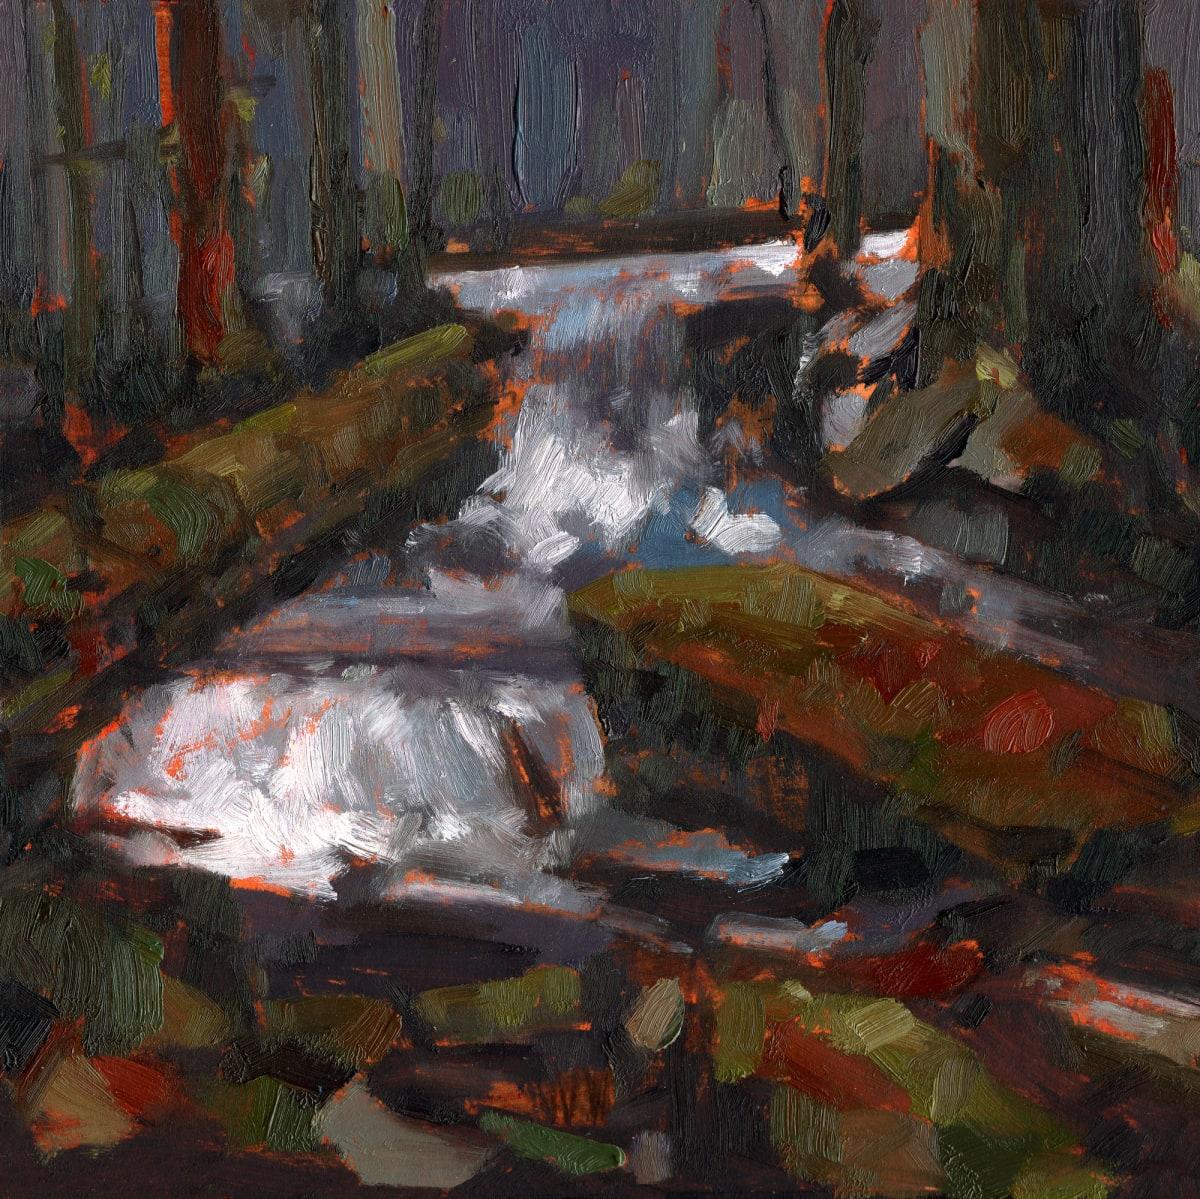 Jared Shear, Thorne Creek, 2019